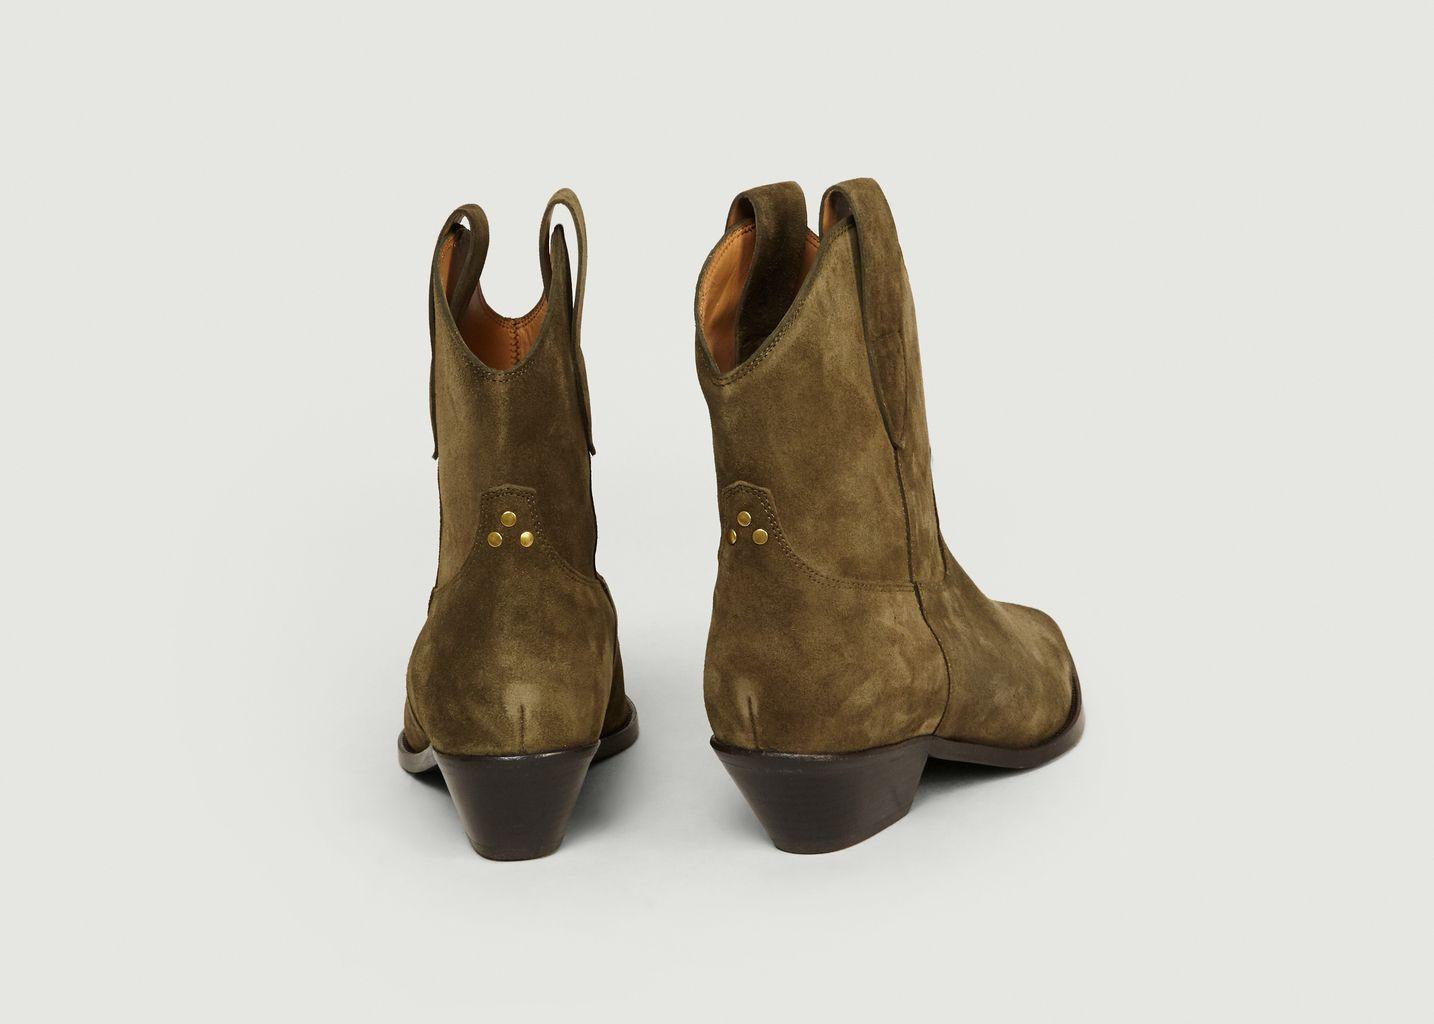 Boots En Croûte de Cuir Sabine - Jérôme Dreyfuss